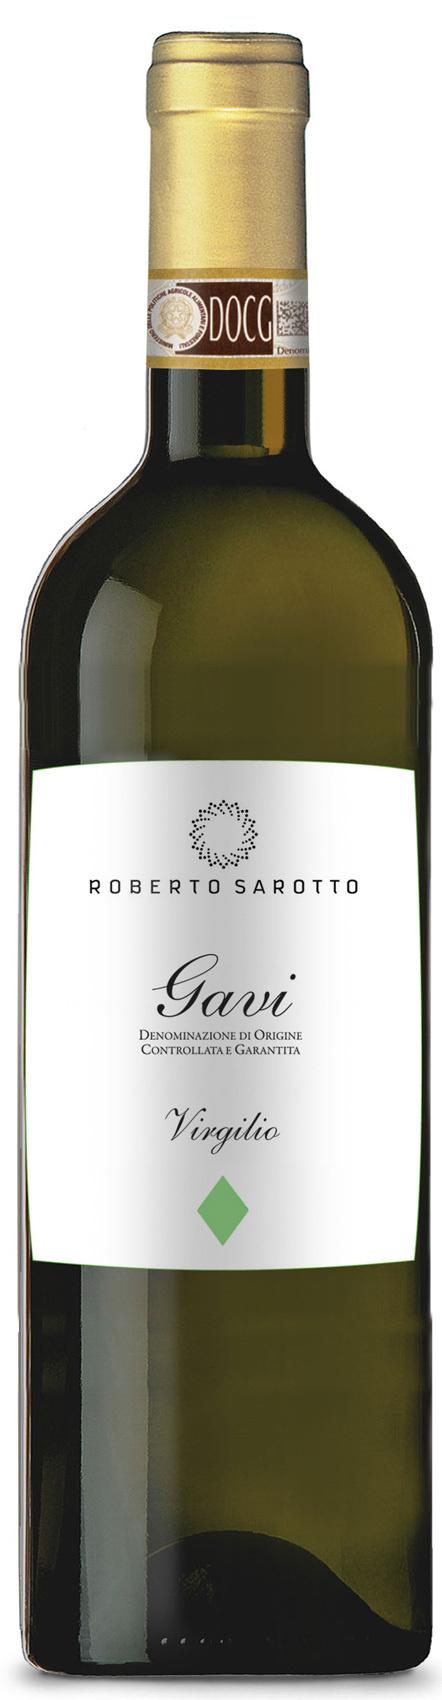 Sarotto, Roberto - Piemont 2020 Gavi Virgilio DOCG, Roberto Sarotto